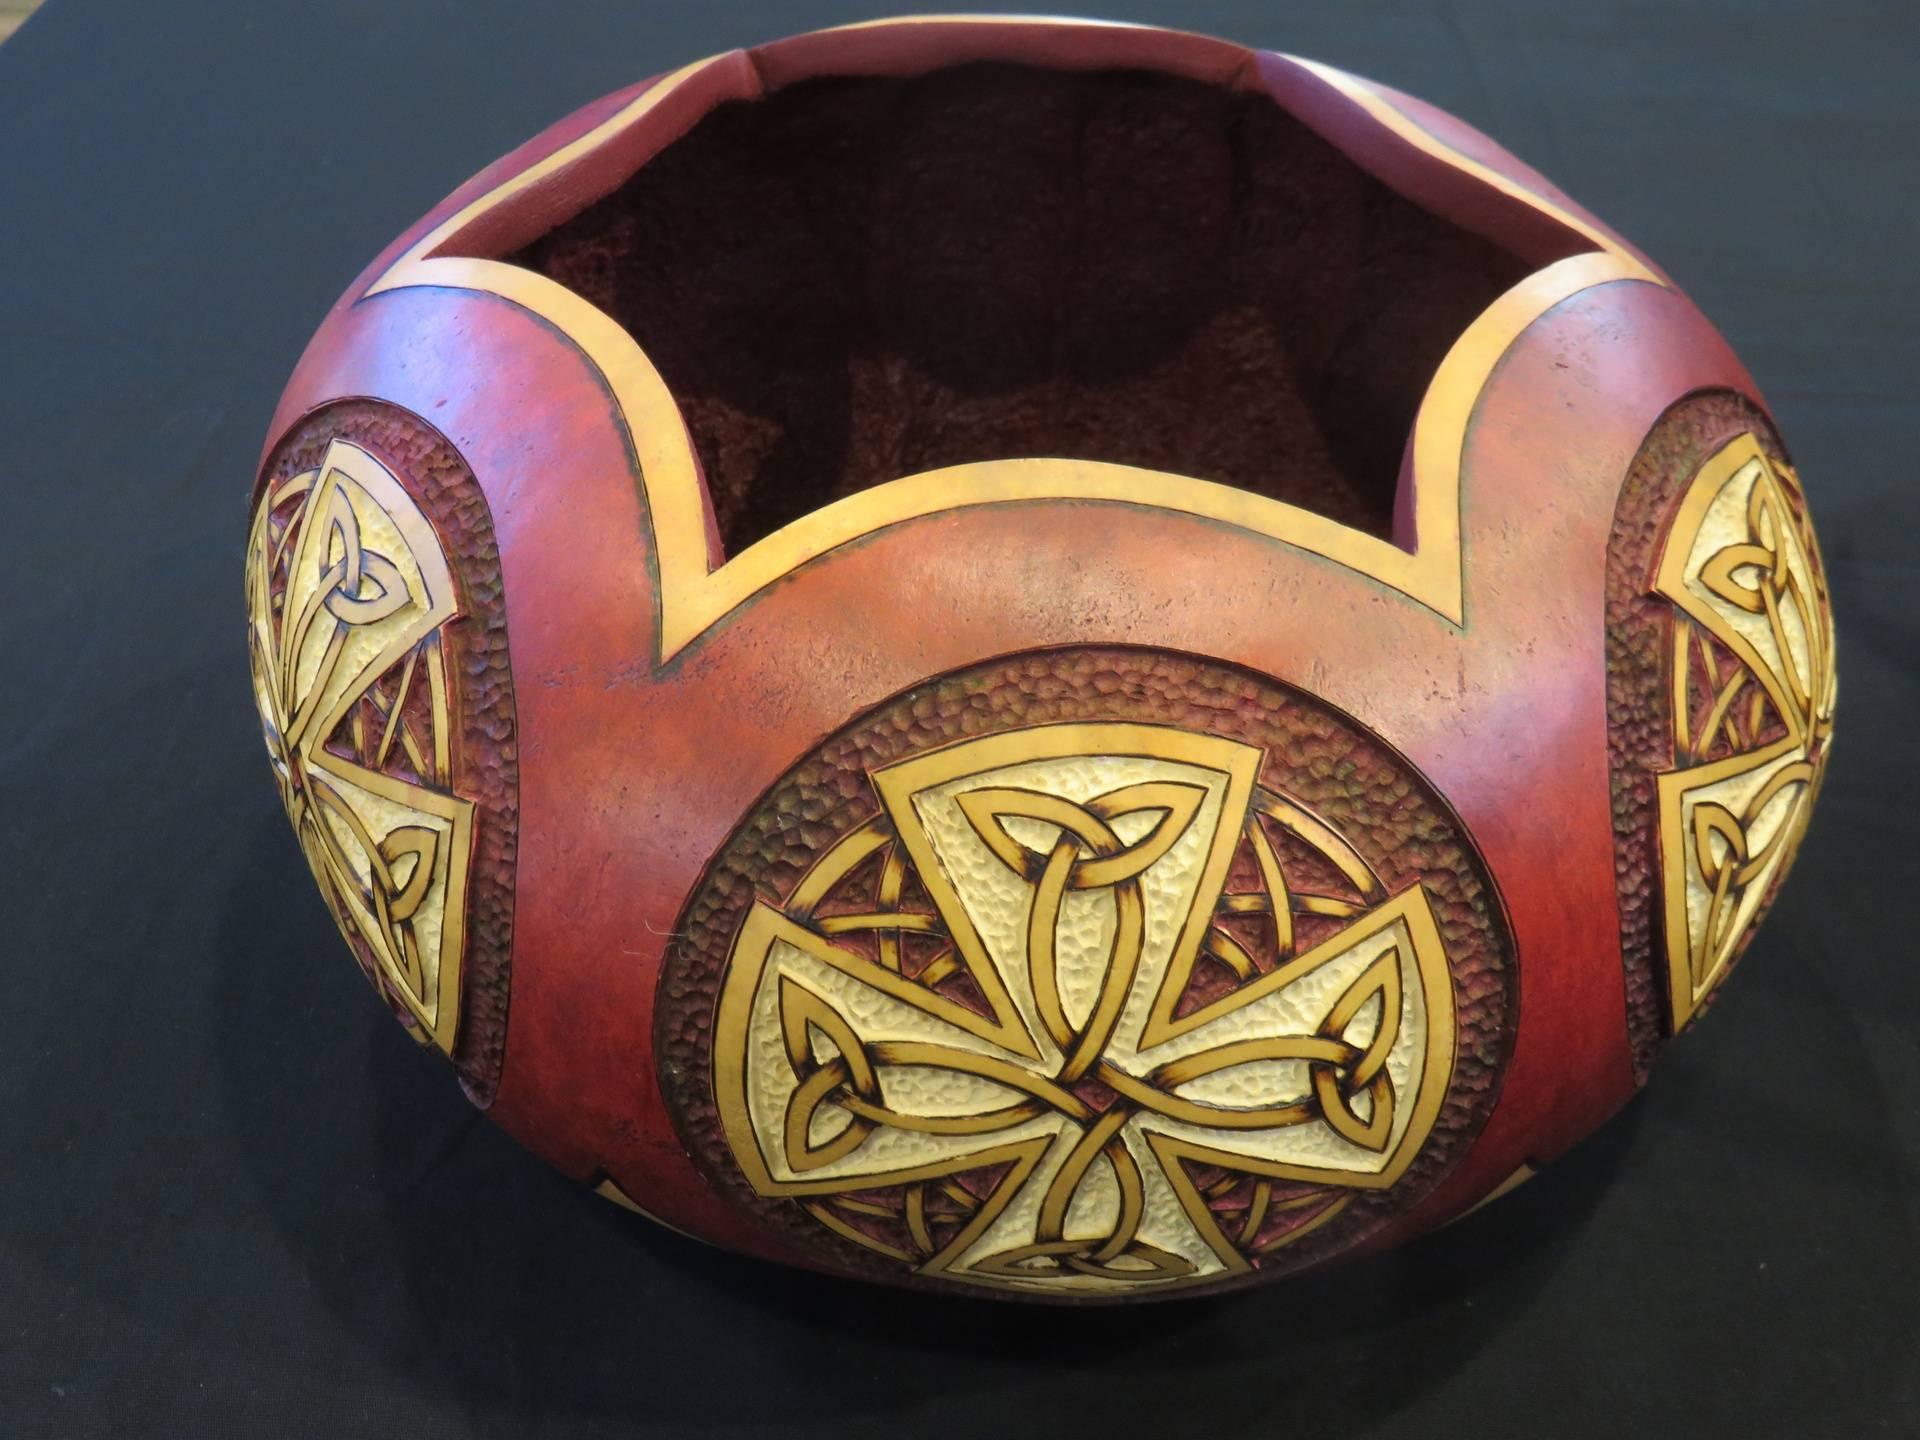 Bowl of Knots